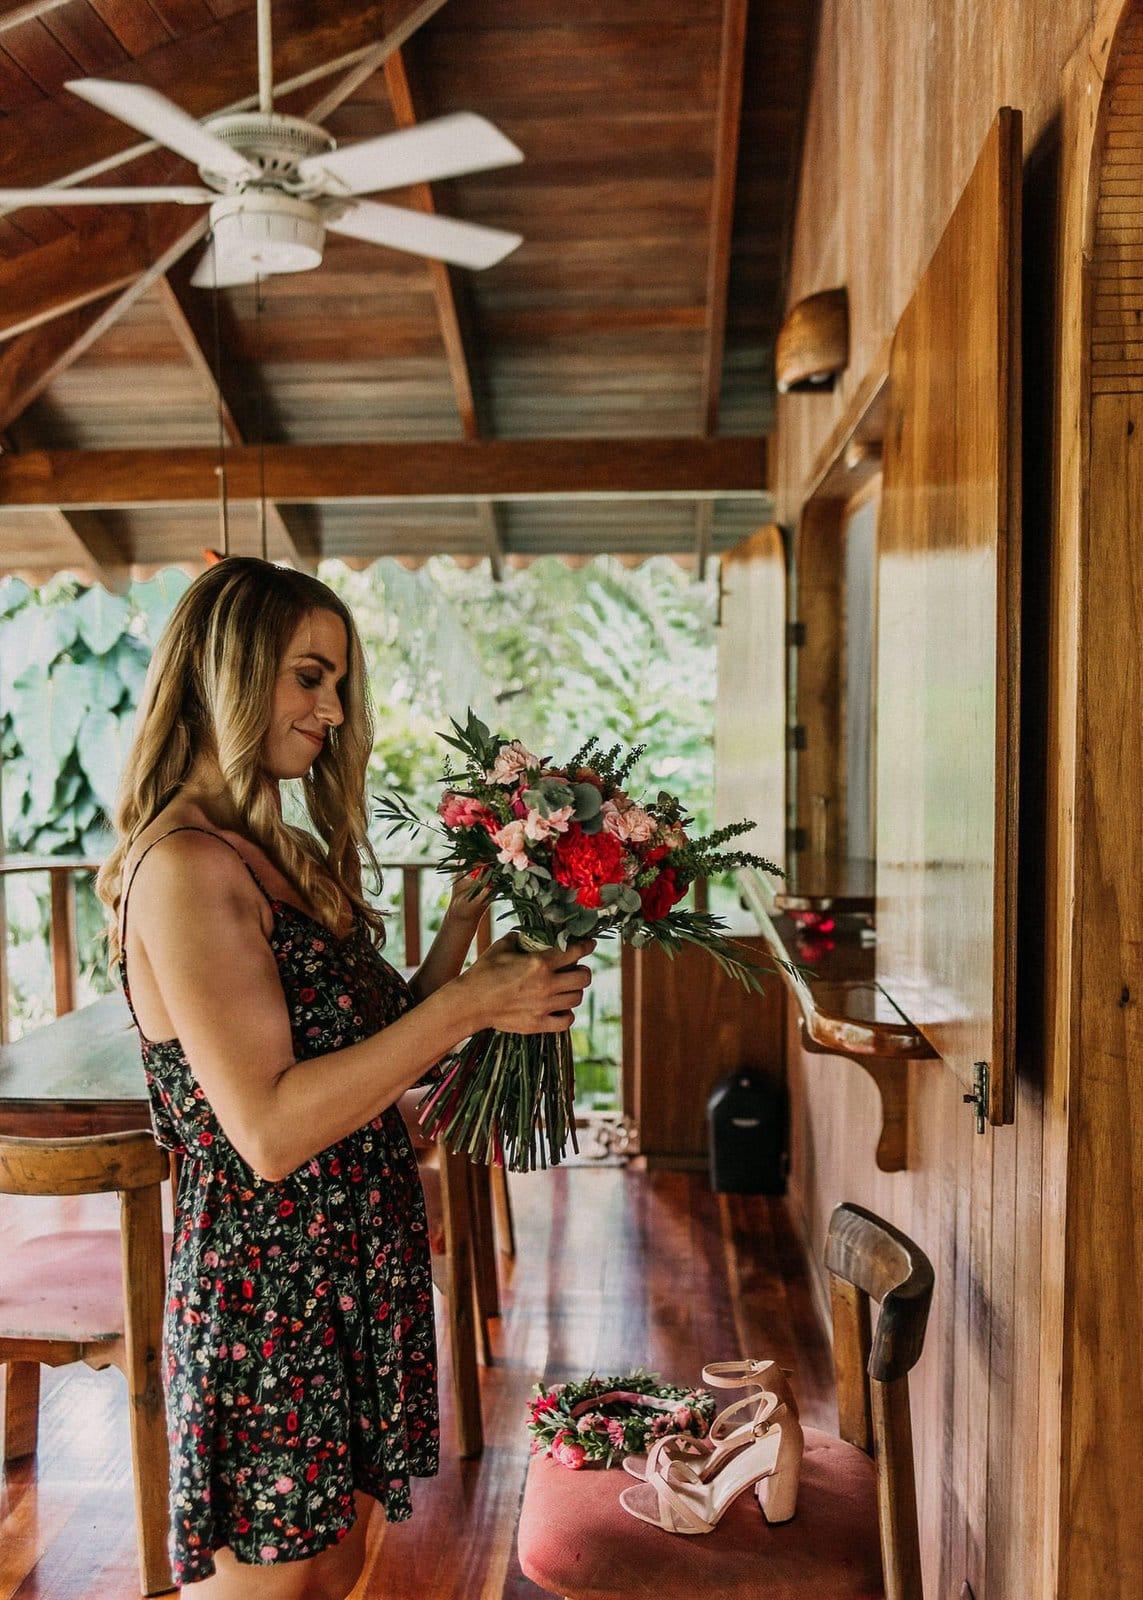 bride admiring wedding bouquet.